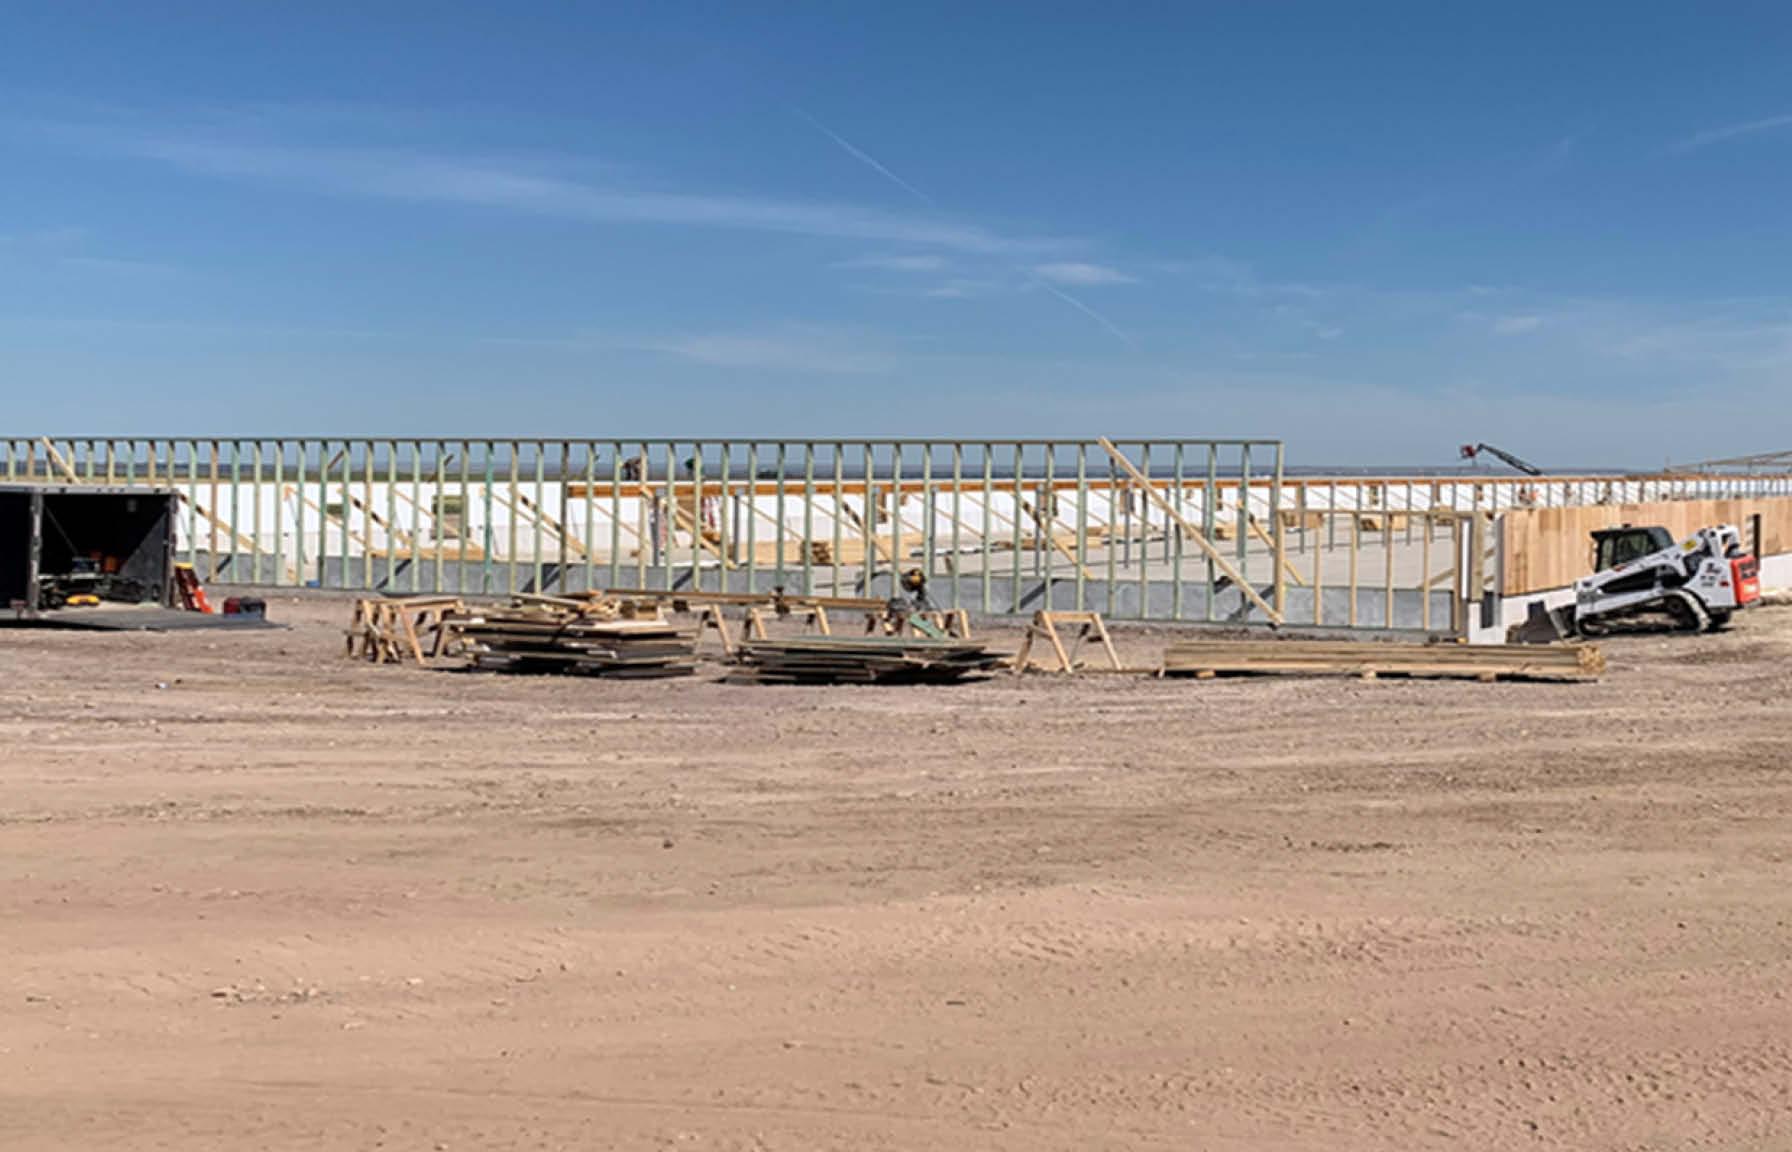 Swine barn construction